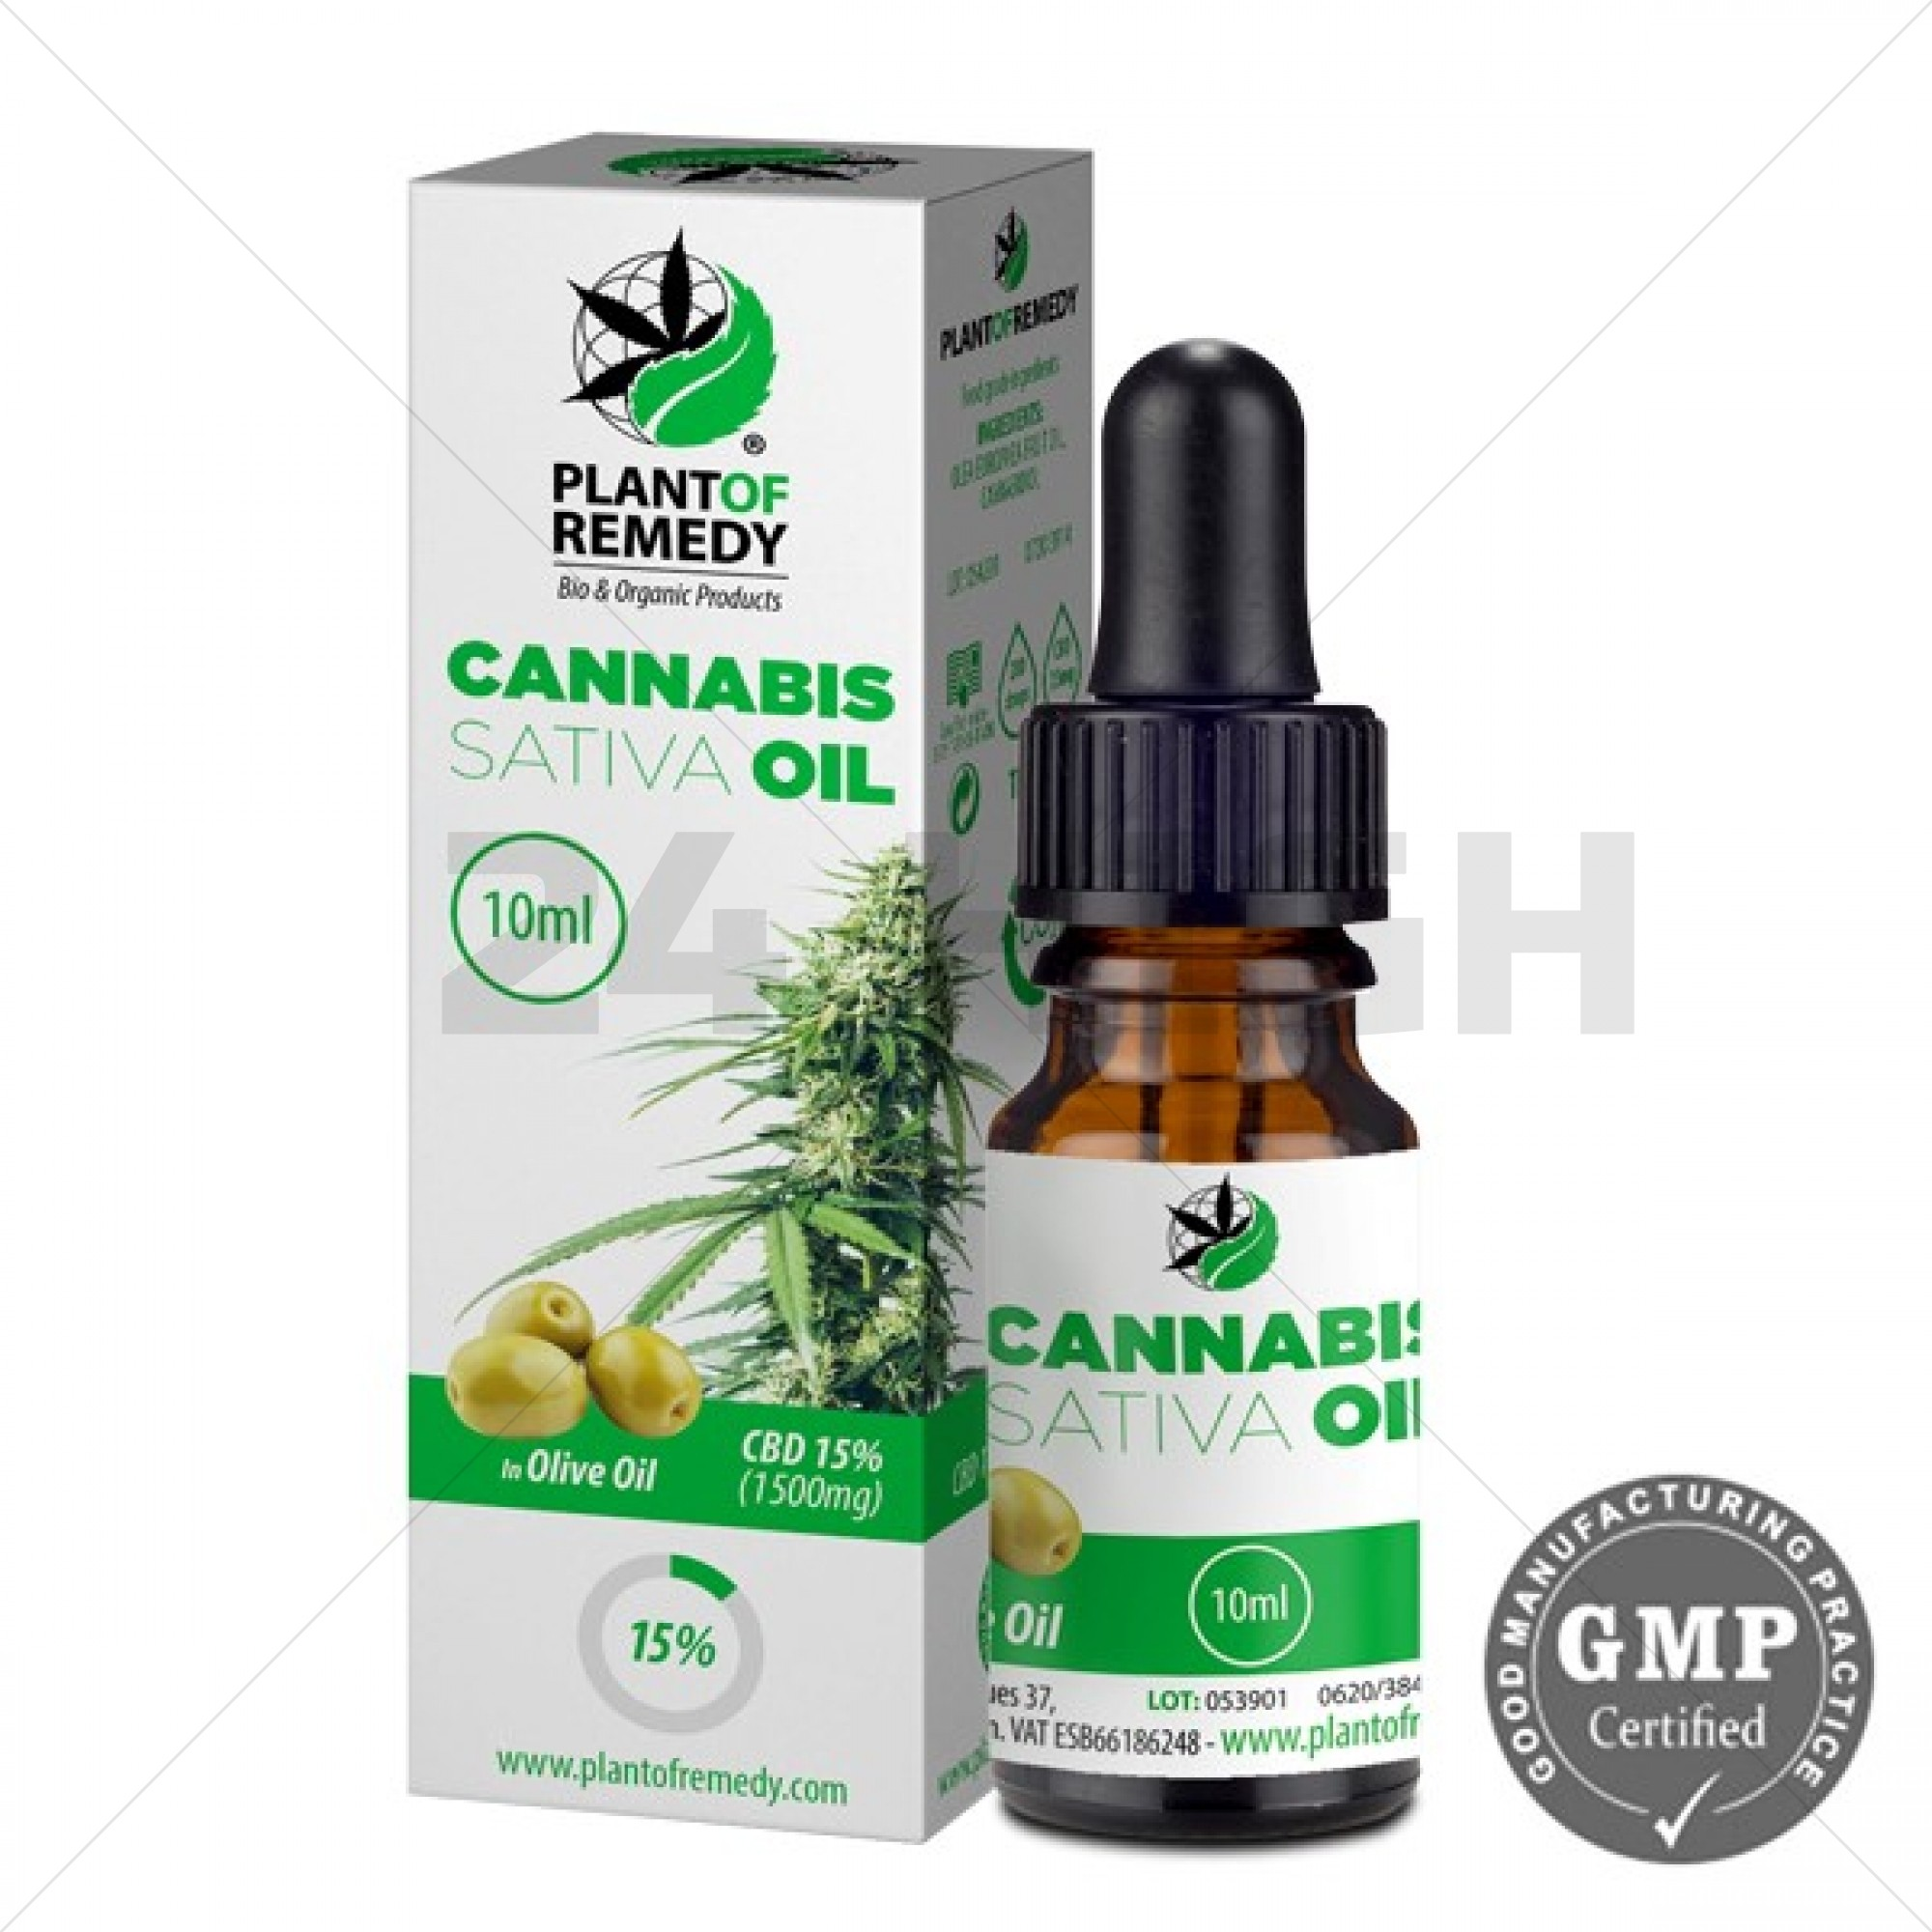 Plant of Remedy Cannabis Olie met Olijfolie - 15% CBD (1500mg)